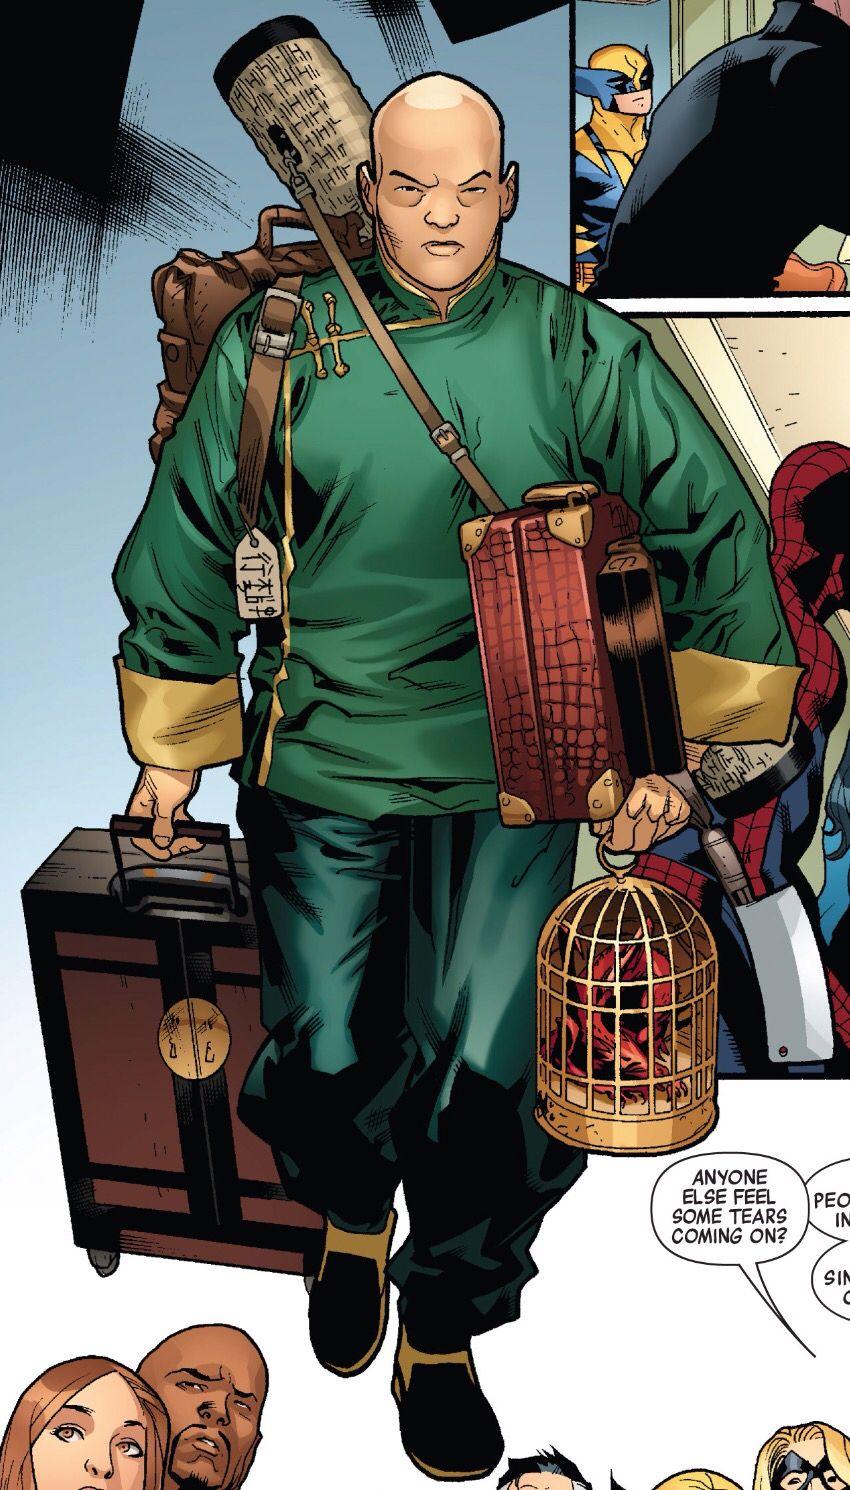 Pin by worldofcolin on Doctor Strange | Marvel comics, Marvel, Comics